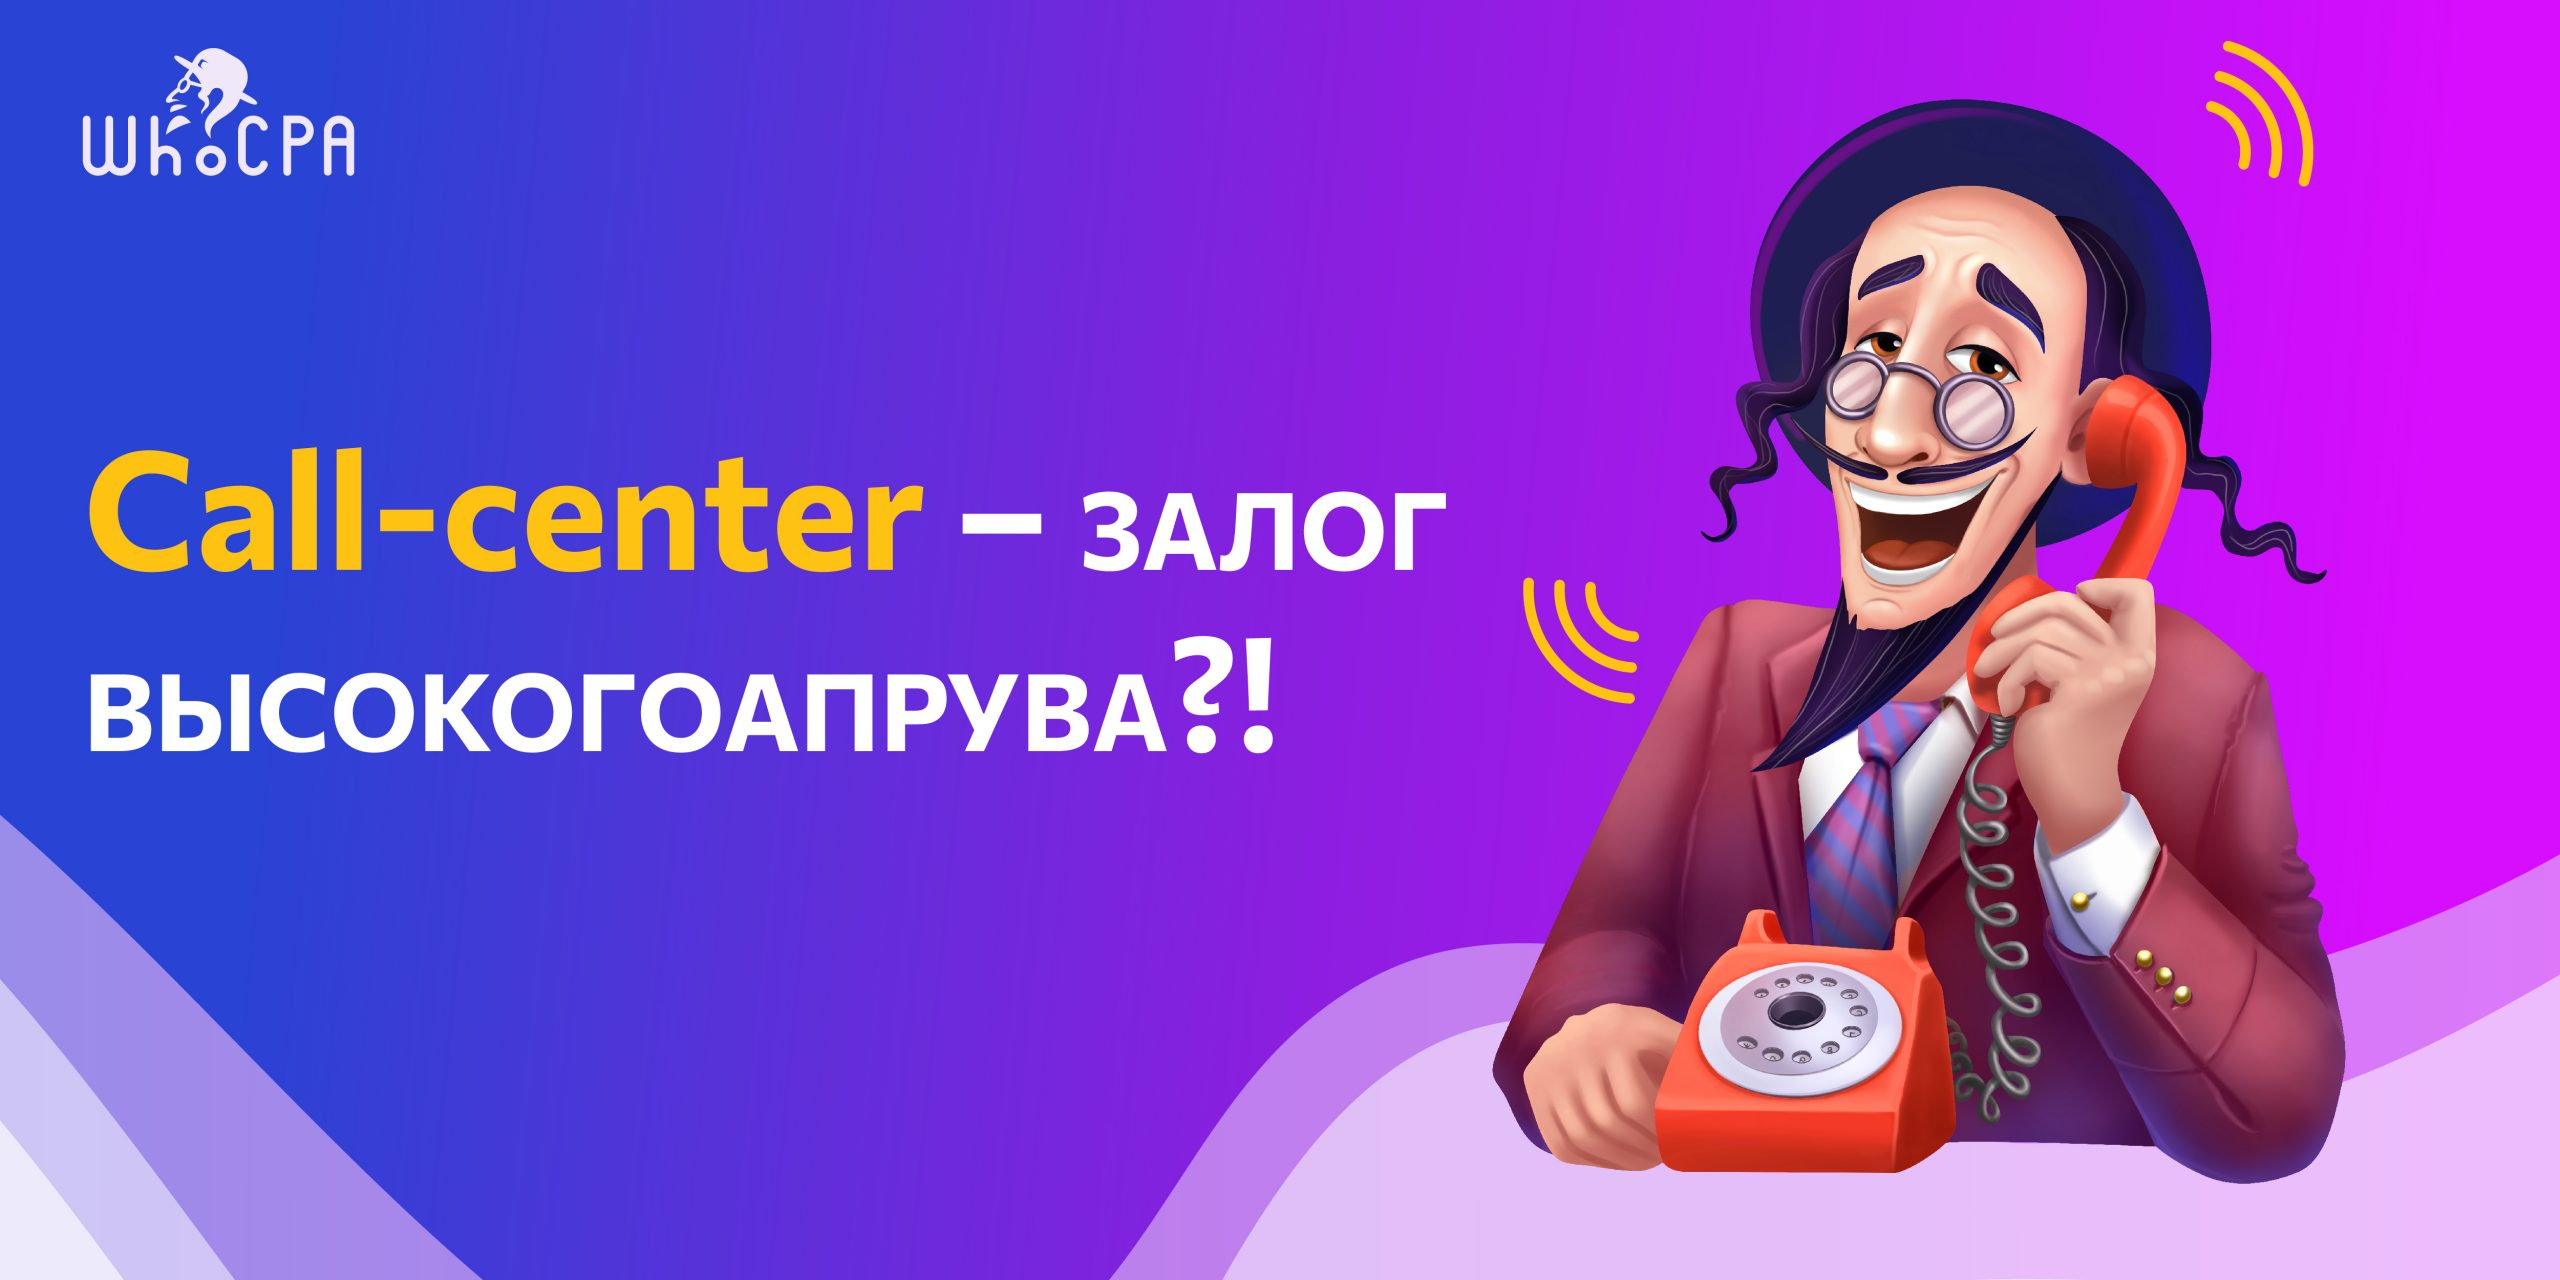 Call-center — залог высокого апрува?